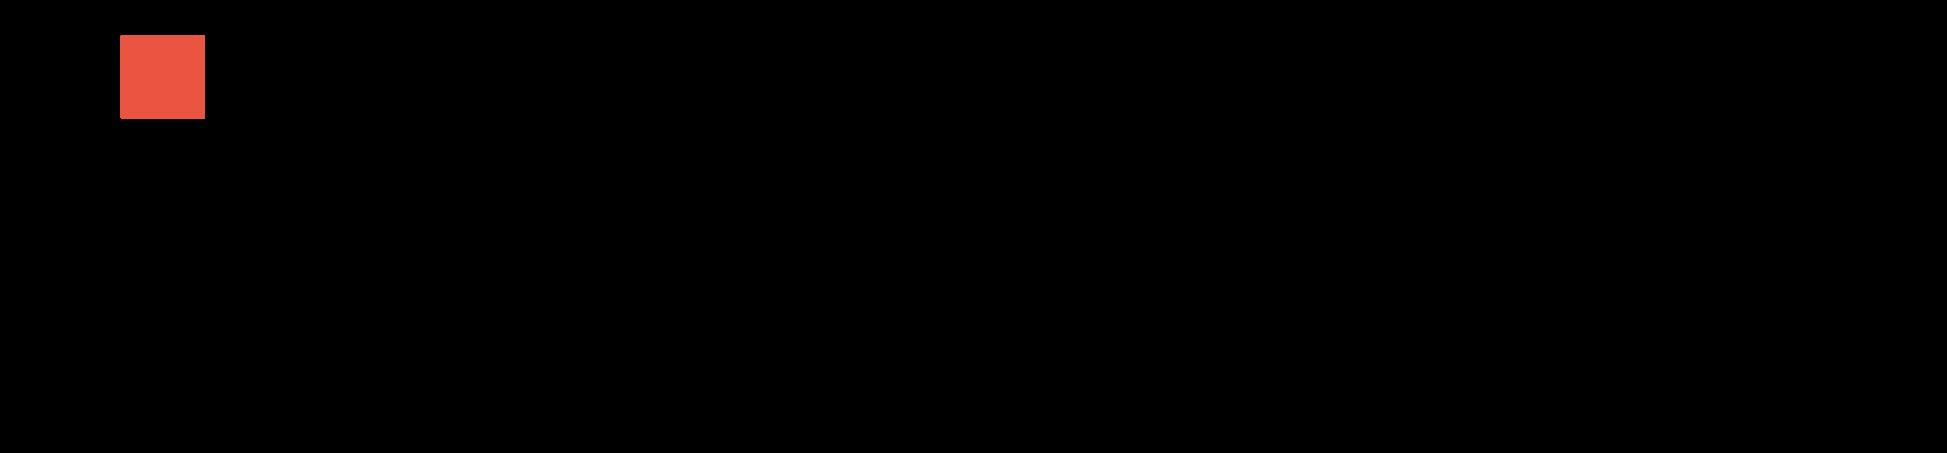 Visian